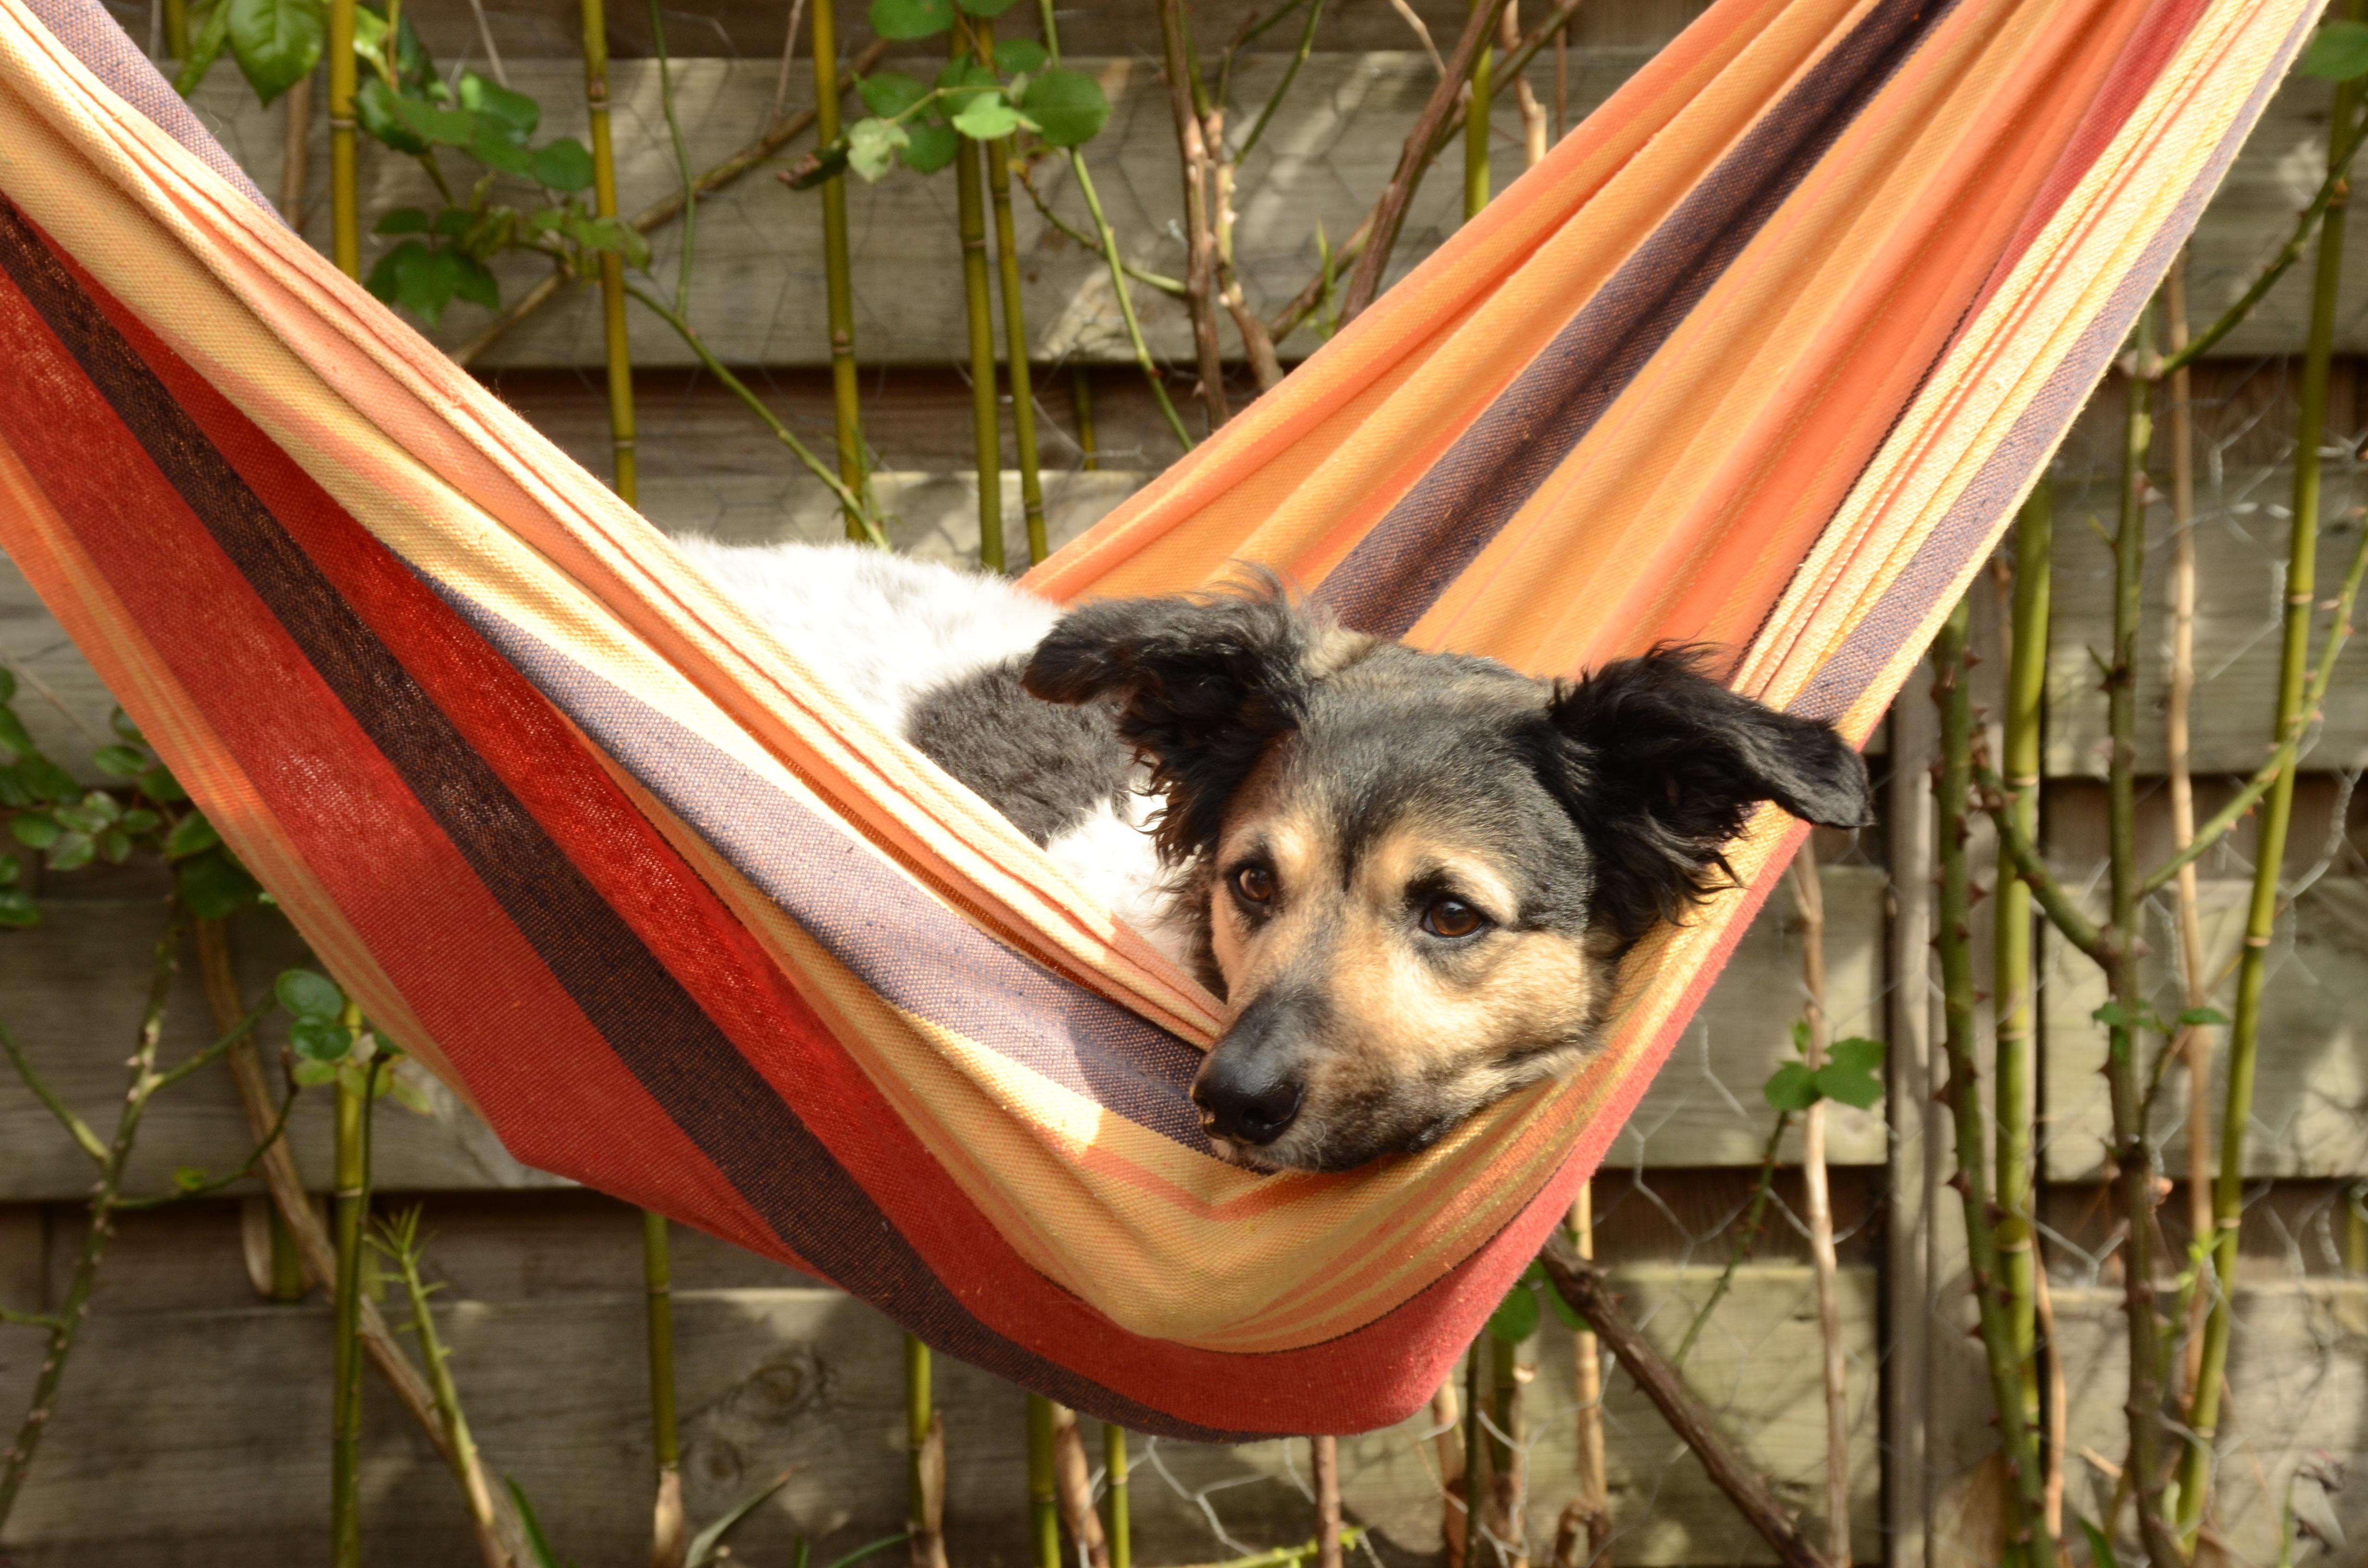 seat car covers product and protectors pet universal sakura hammock